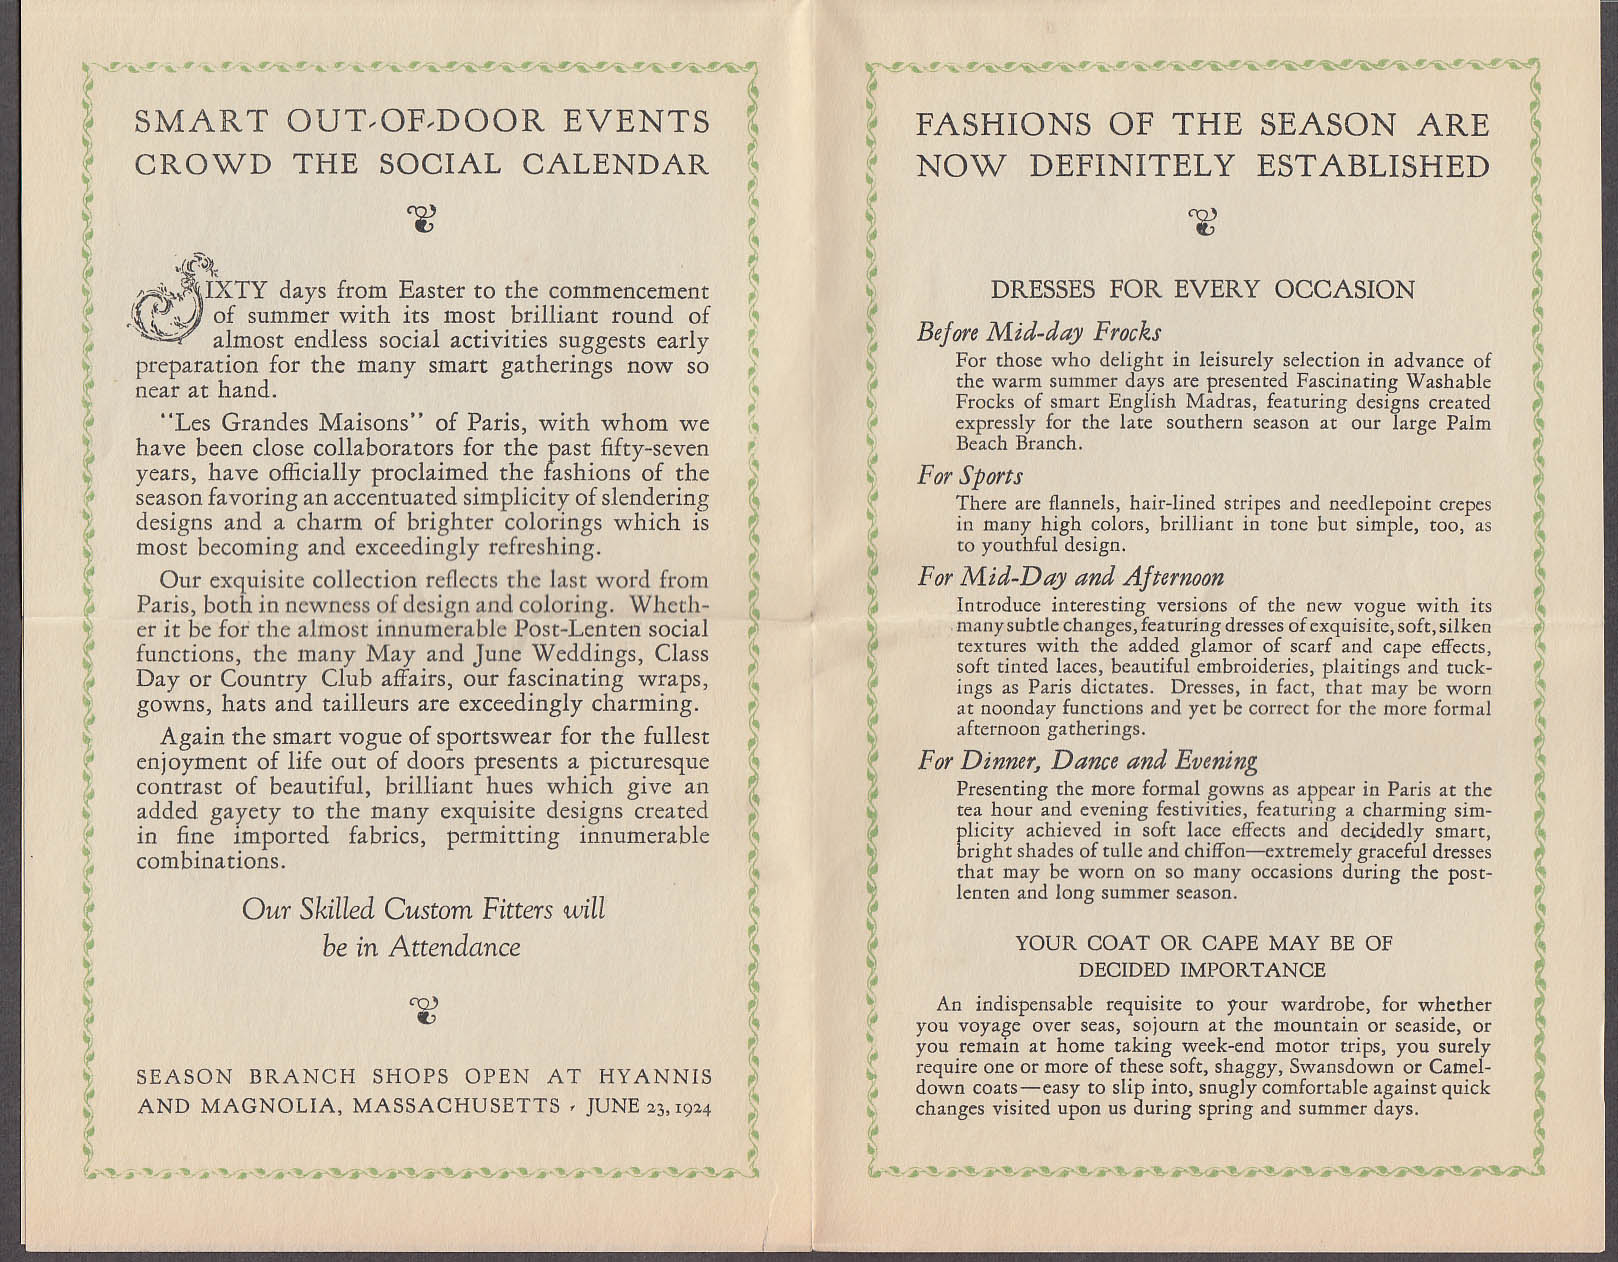 House of Manahan Summer Fashion Show Invitation Wheaton Inn Norton MA 1924